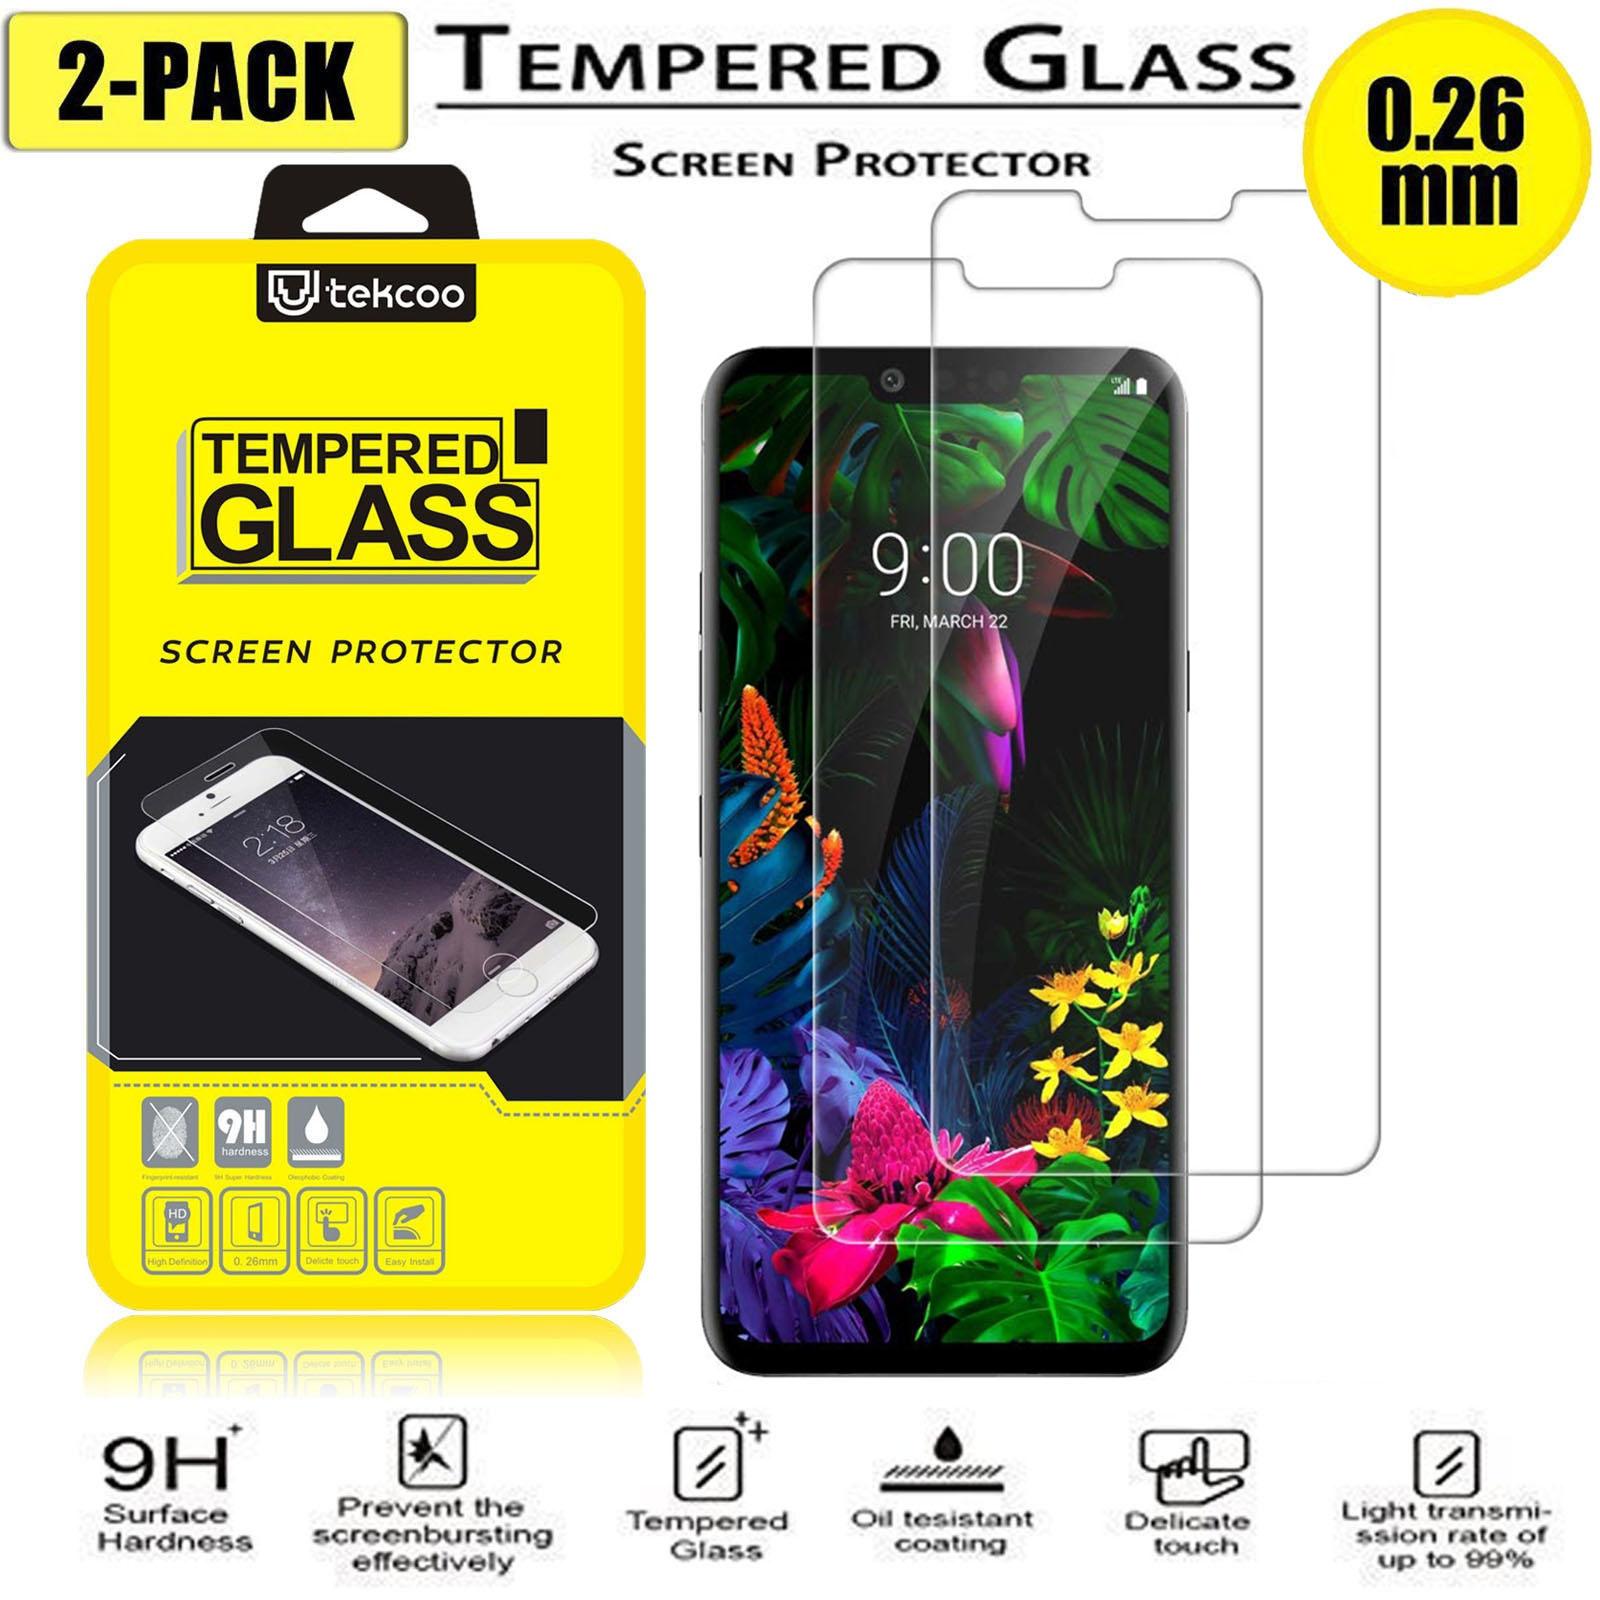 2 Pcs HD Tempered Glass Screen Protector For LG Aristo / Aristo 2 / Stylo 2 / 3 / 4 / K20 Plus /Zone 4 / K40 / K30 / G8 / 7 / 6